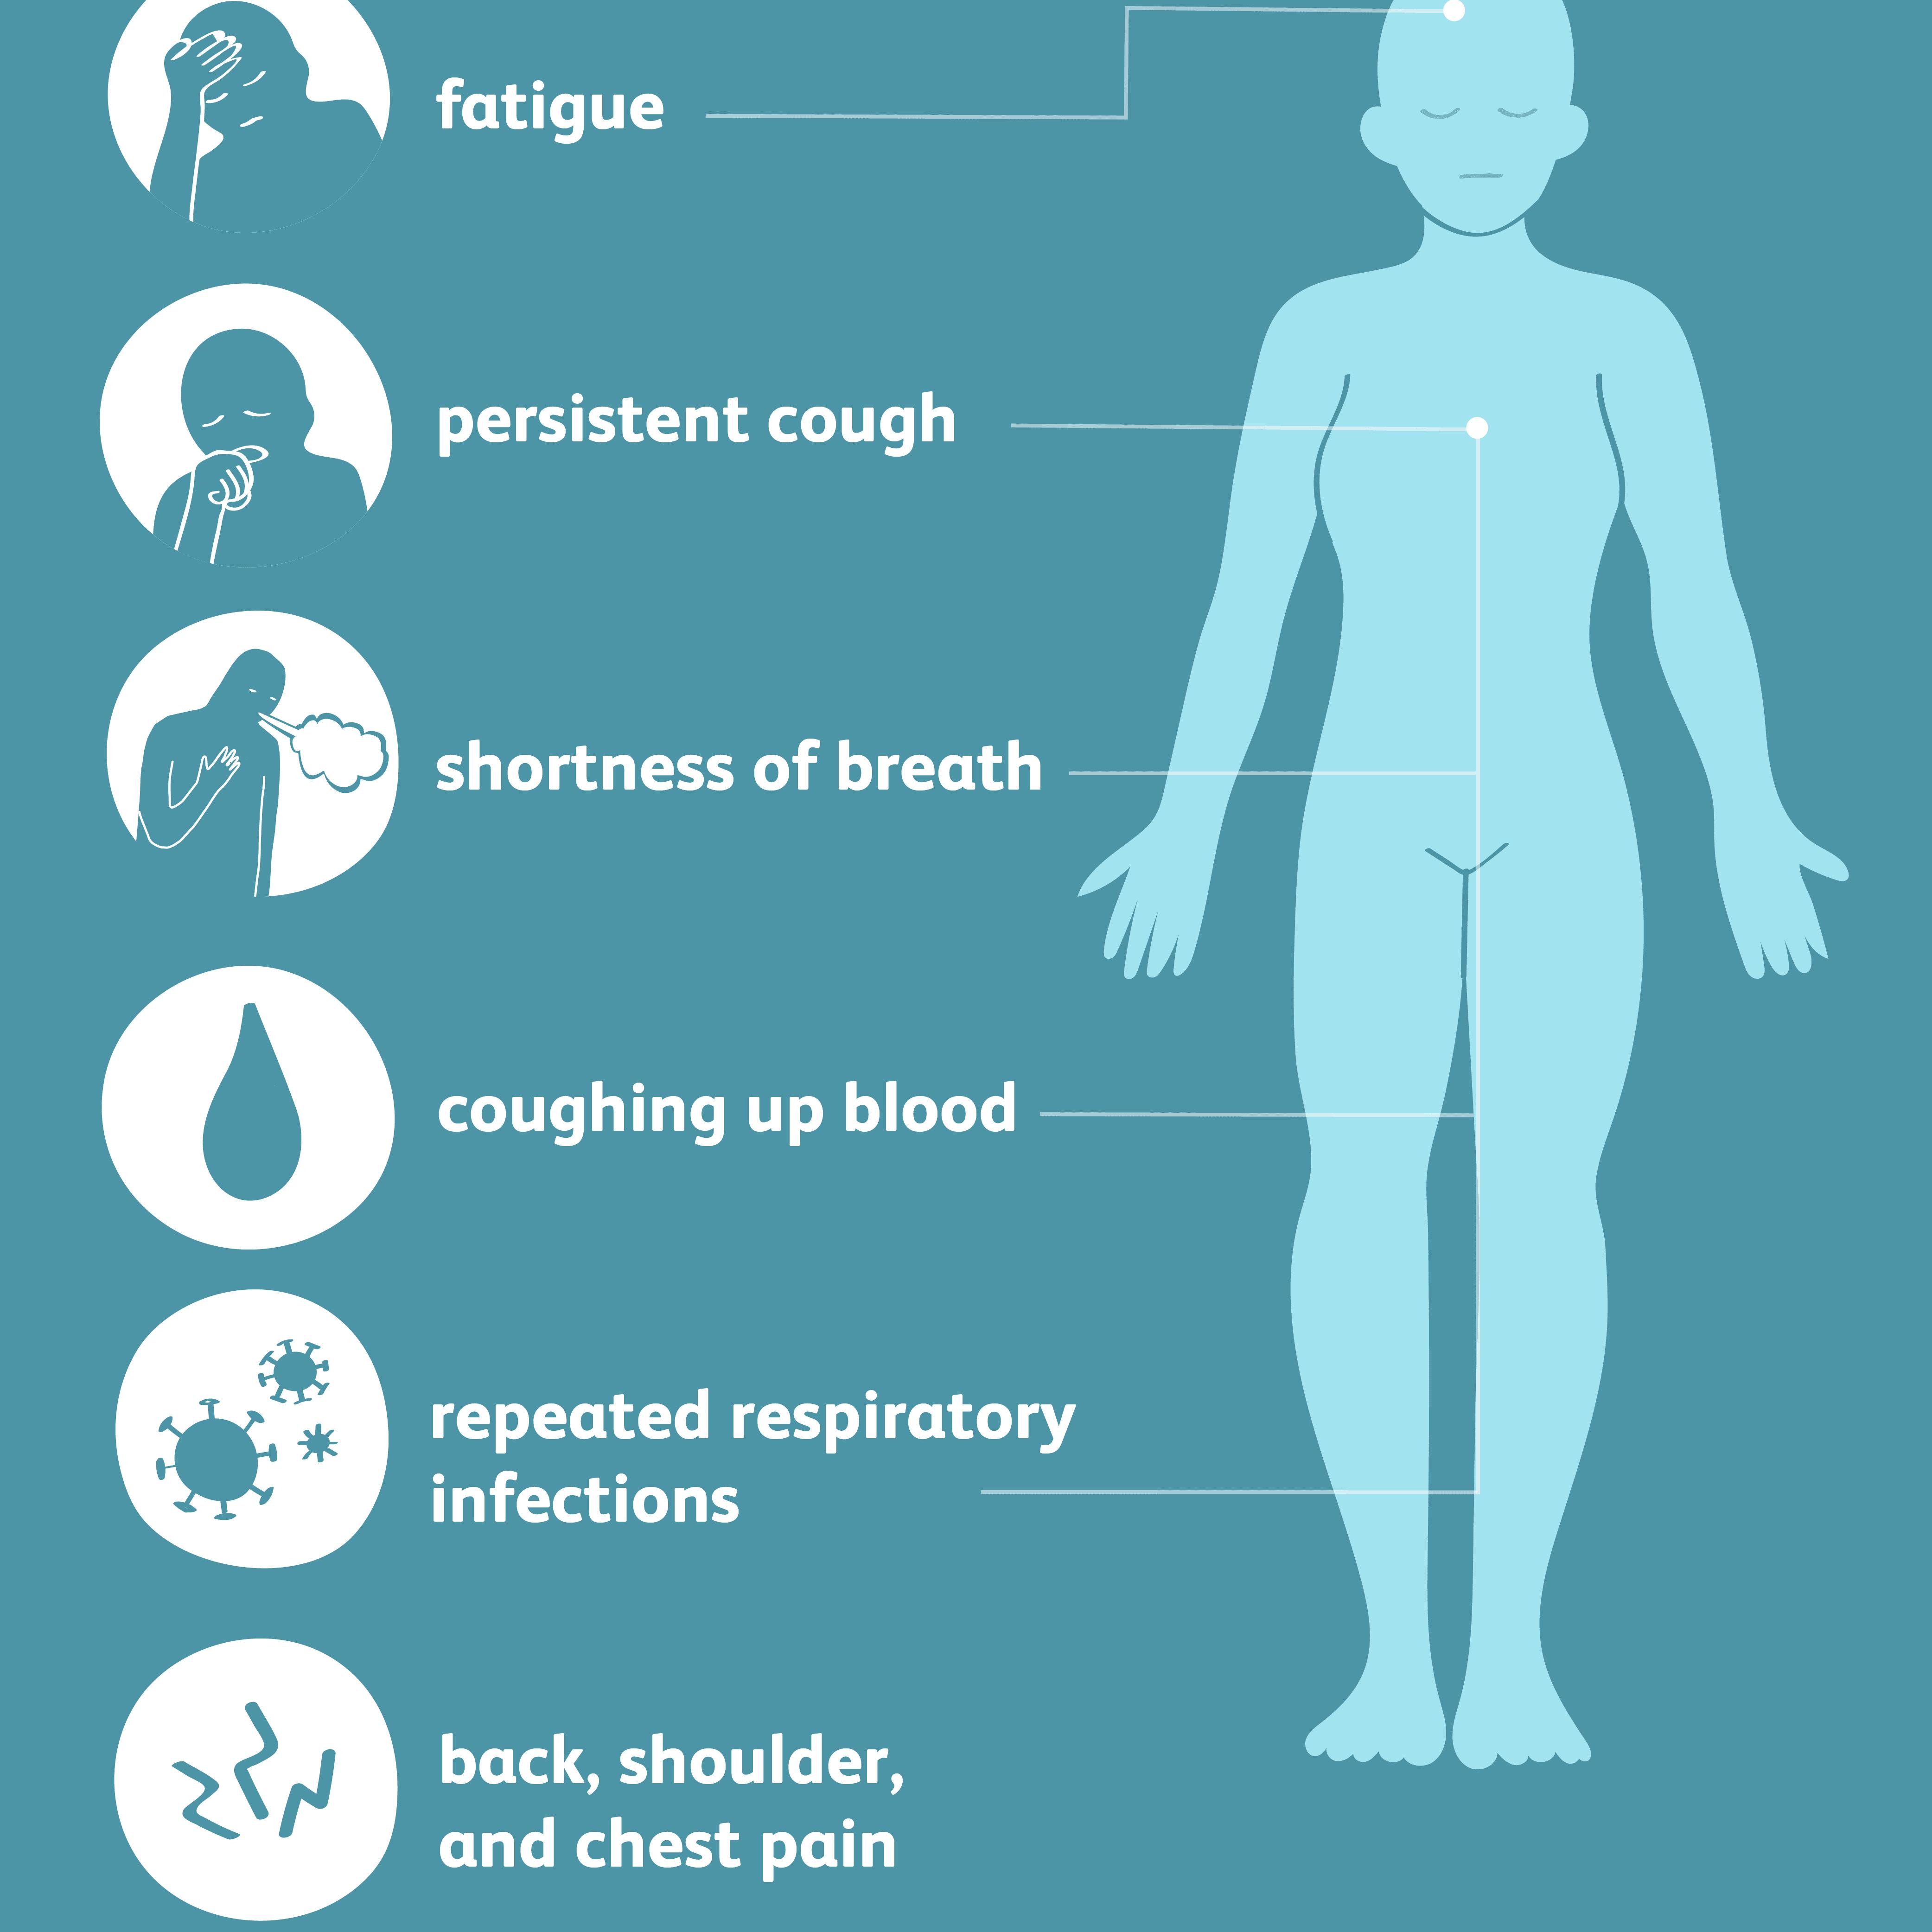 Hpv and wart symptoms, Human Papillomavirus - HPV - Nucleus Health centru de dezintoxicare alcool